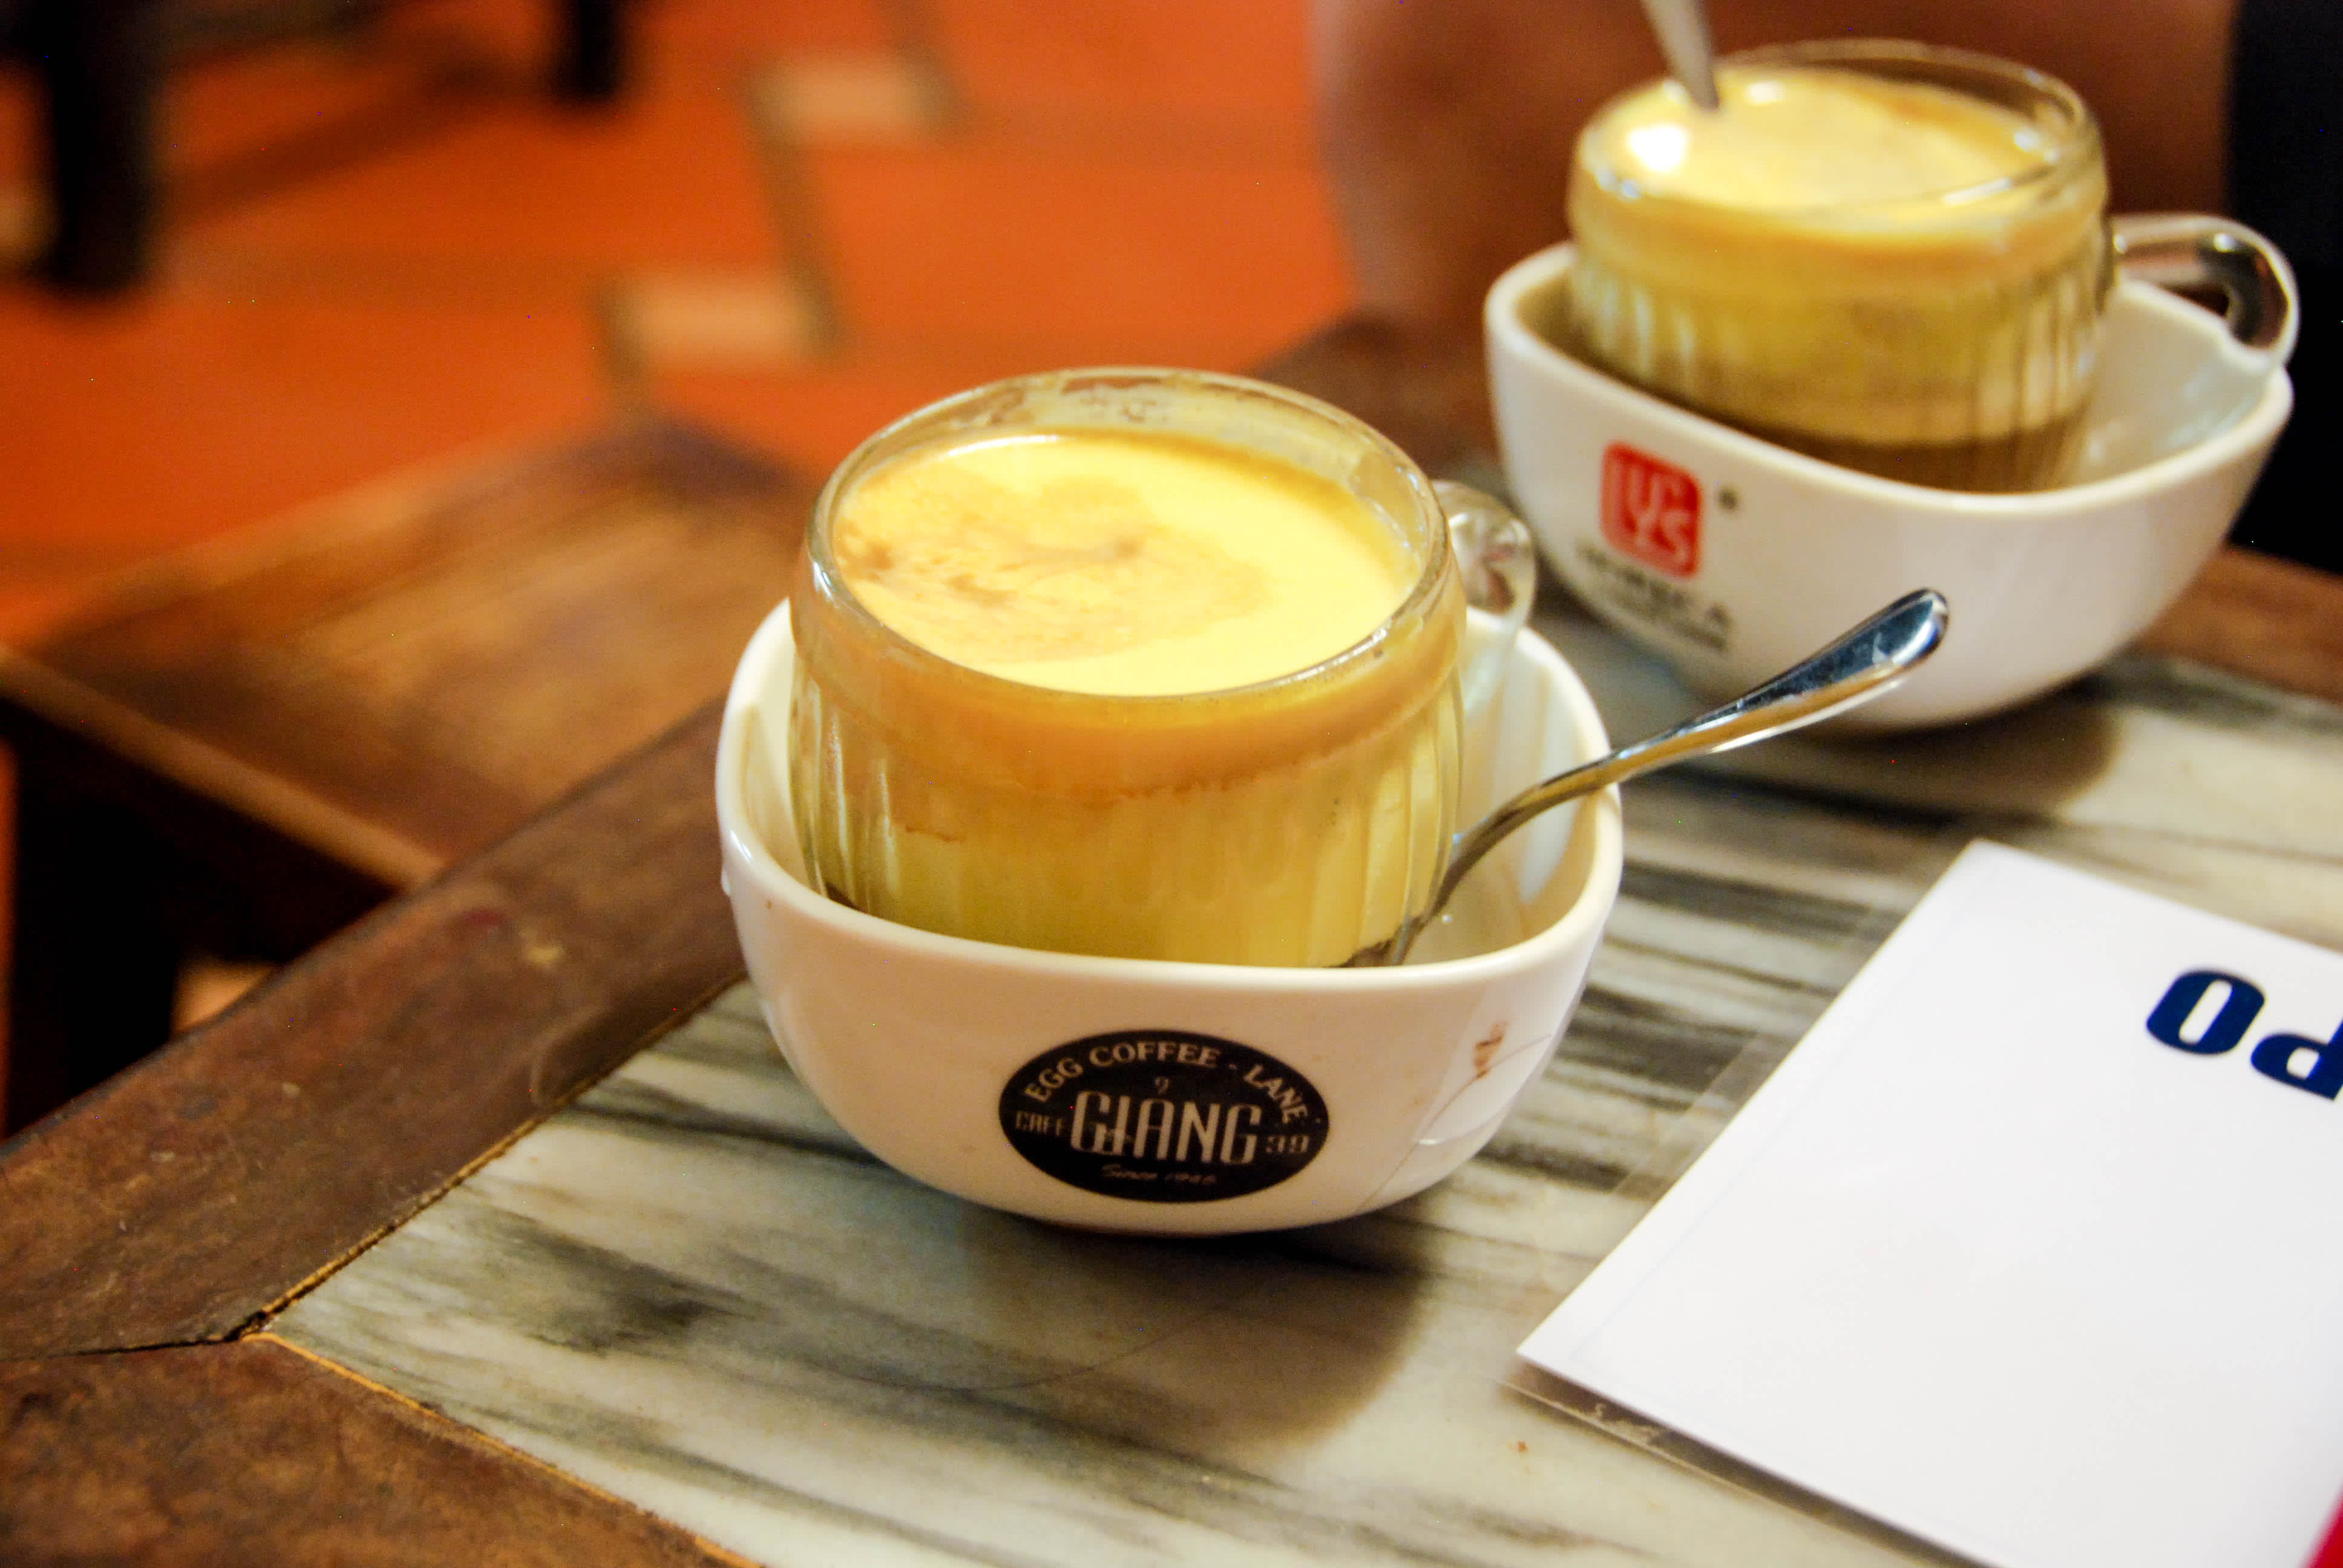 Why Starbucks has less than 3% of Vietnam's billion dollar coffee and tea market